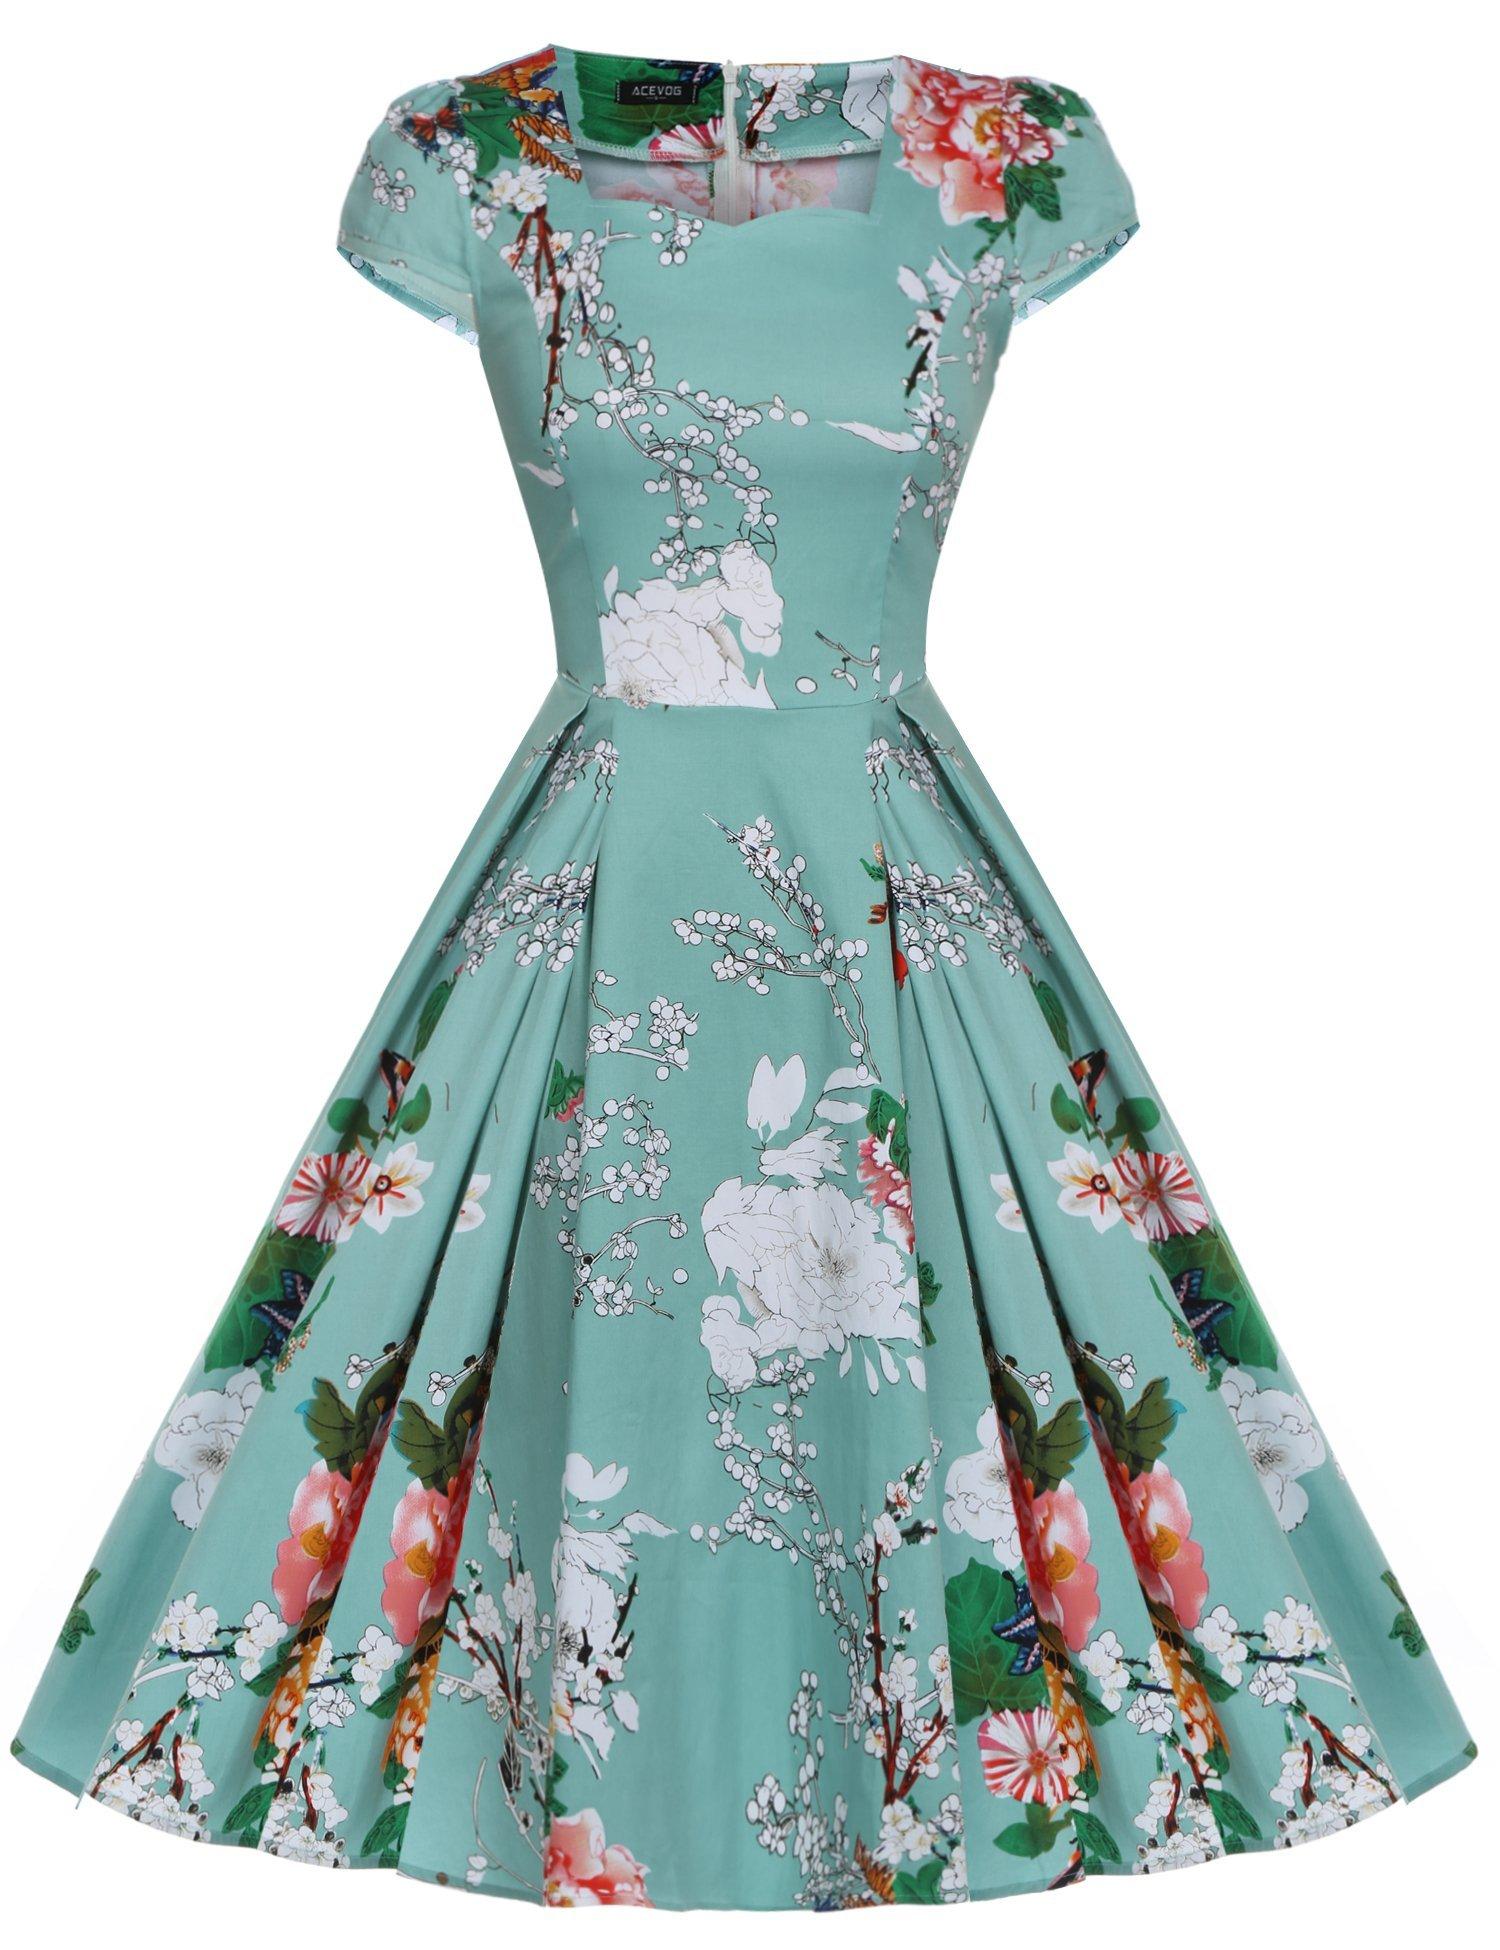 Acevog Women S 1950s Cap Sleeve Swing Vintage Floral Party